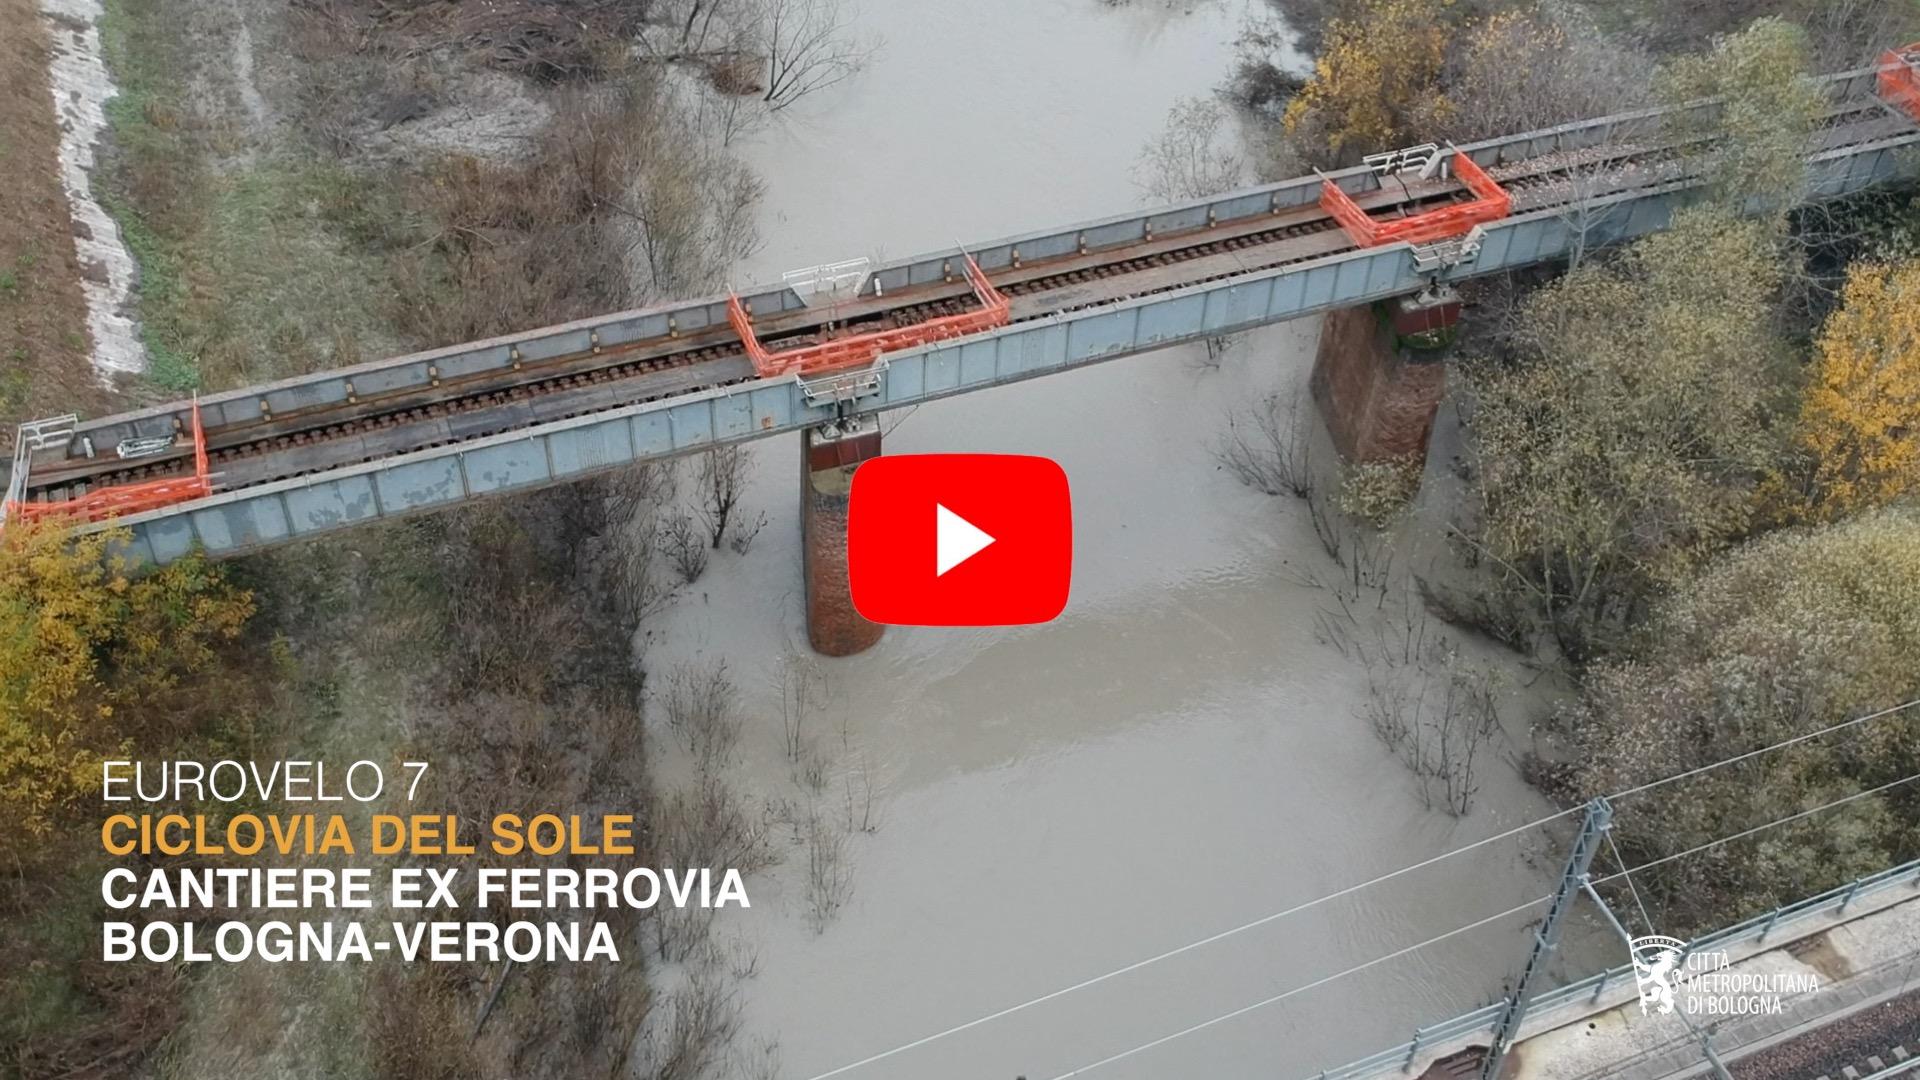 Ciclovia del Sole, il ponte sul Panaro Camposanto. Febbraio 2020